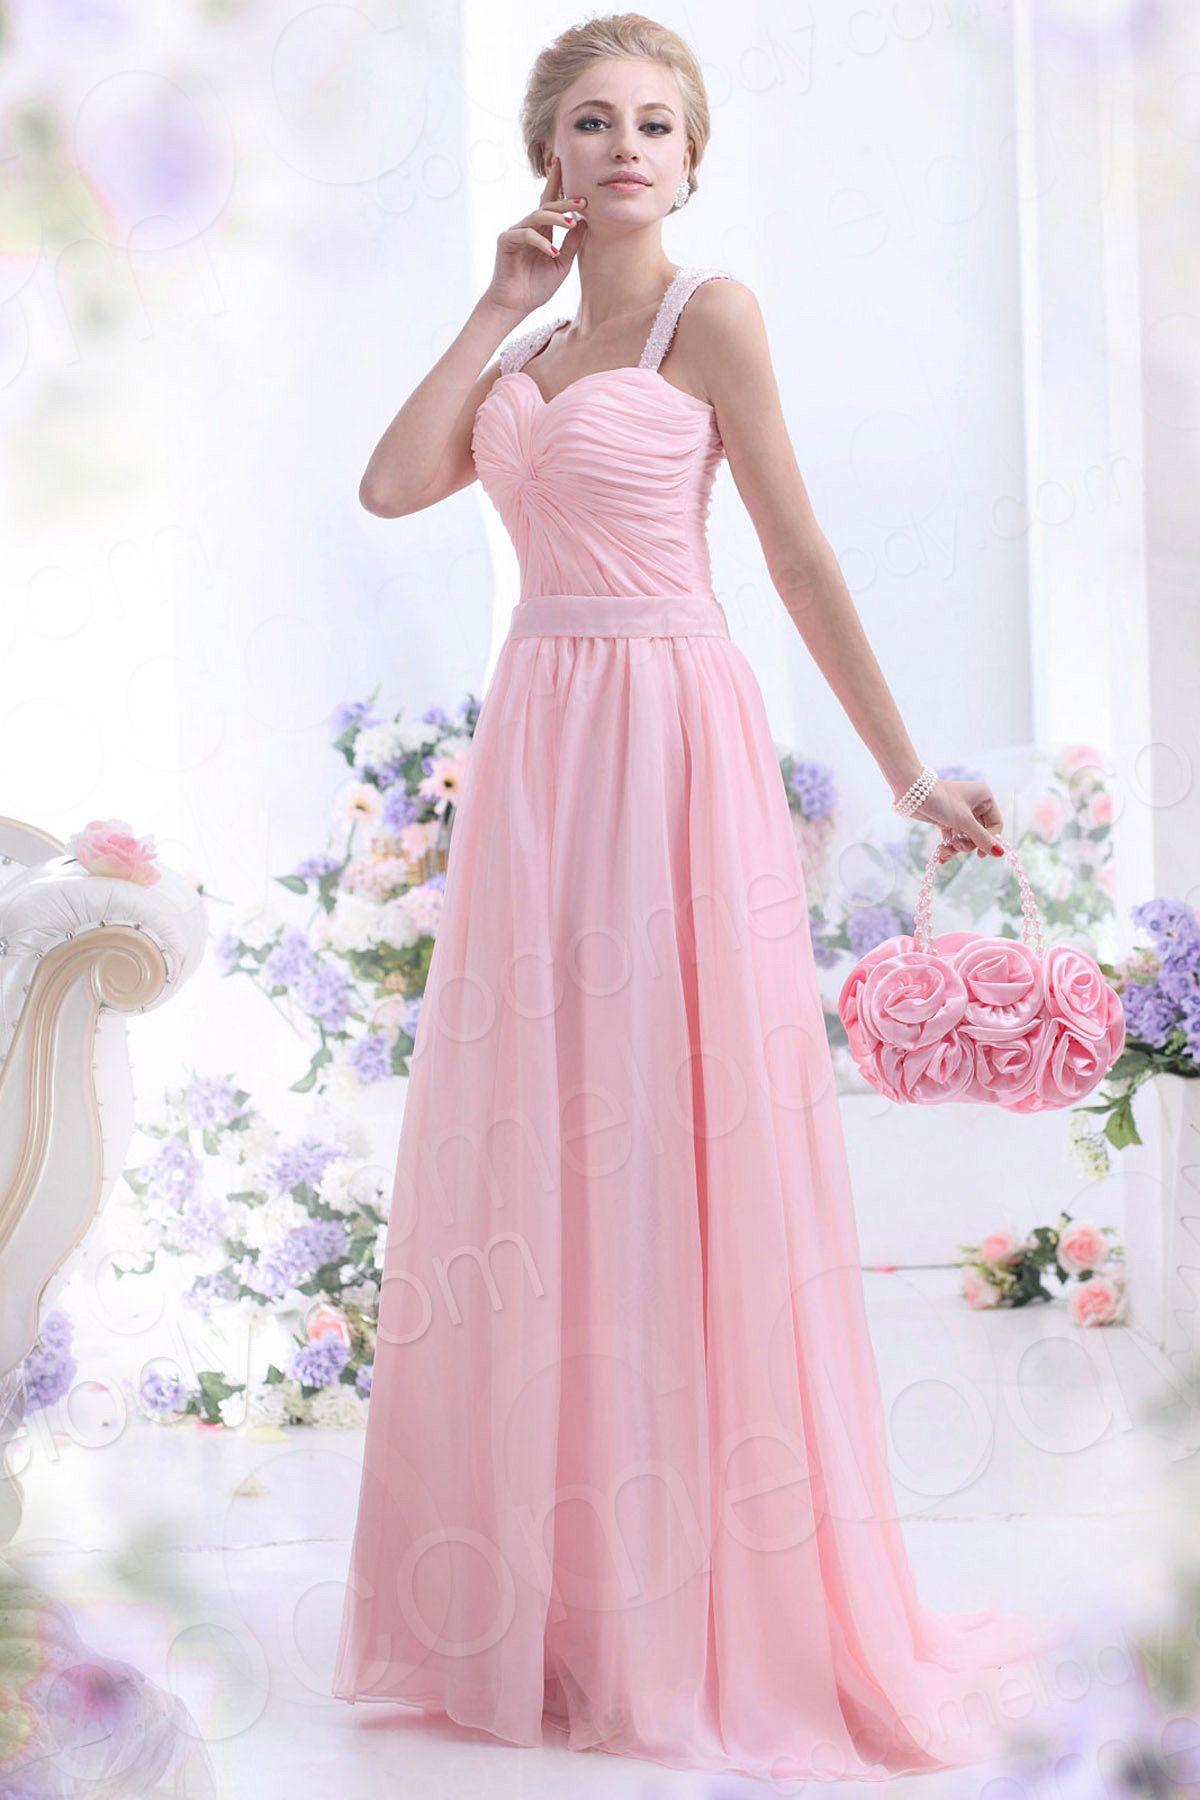 Sweet sheathcolumn straps sweepbrush train chiffon primrose pink